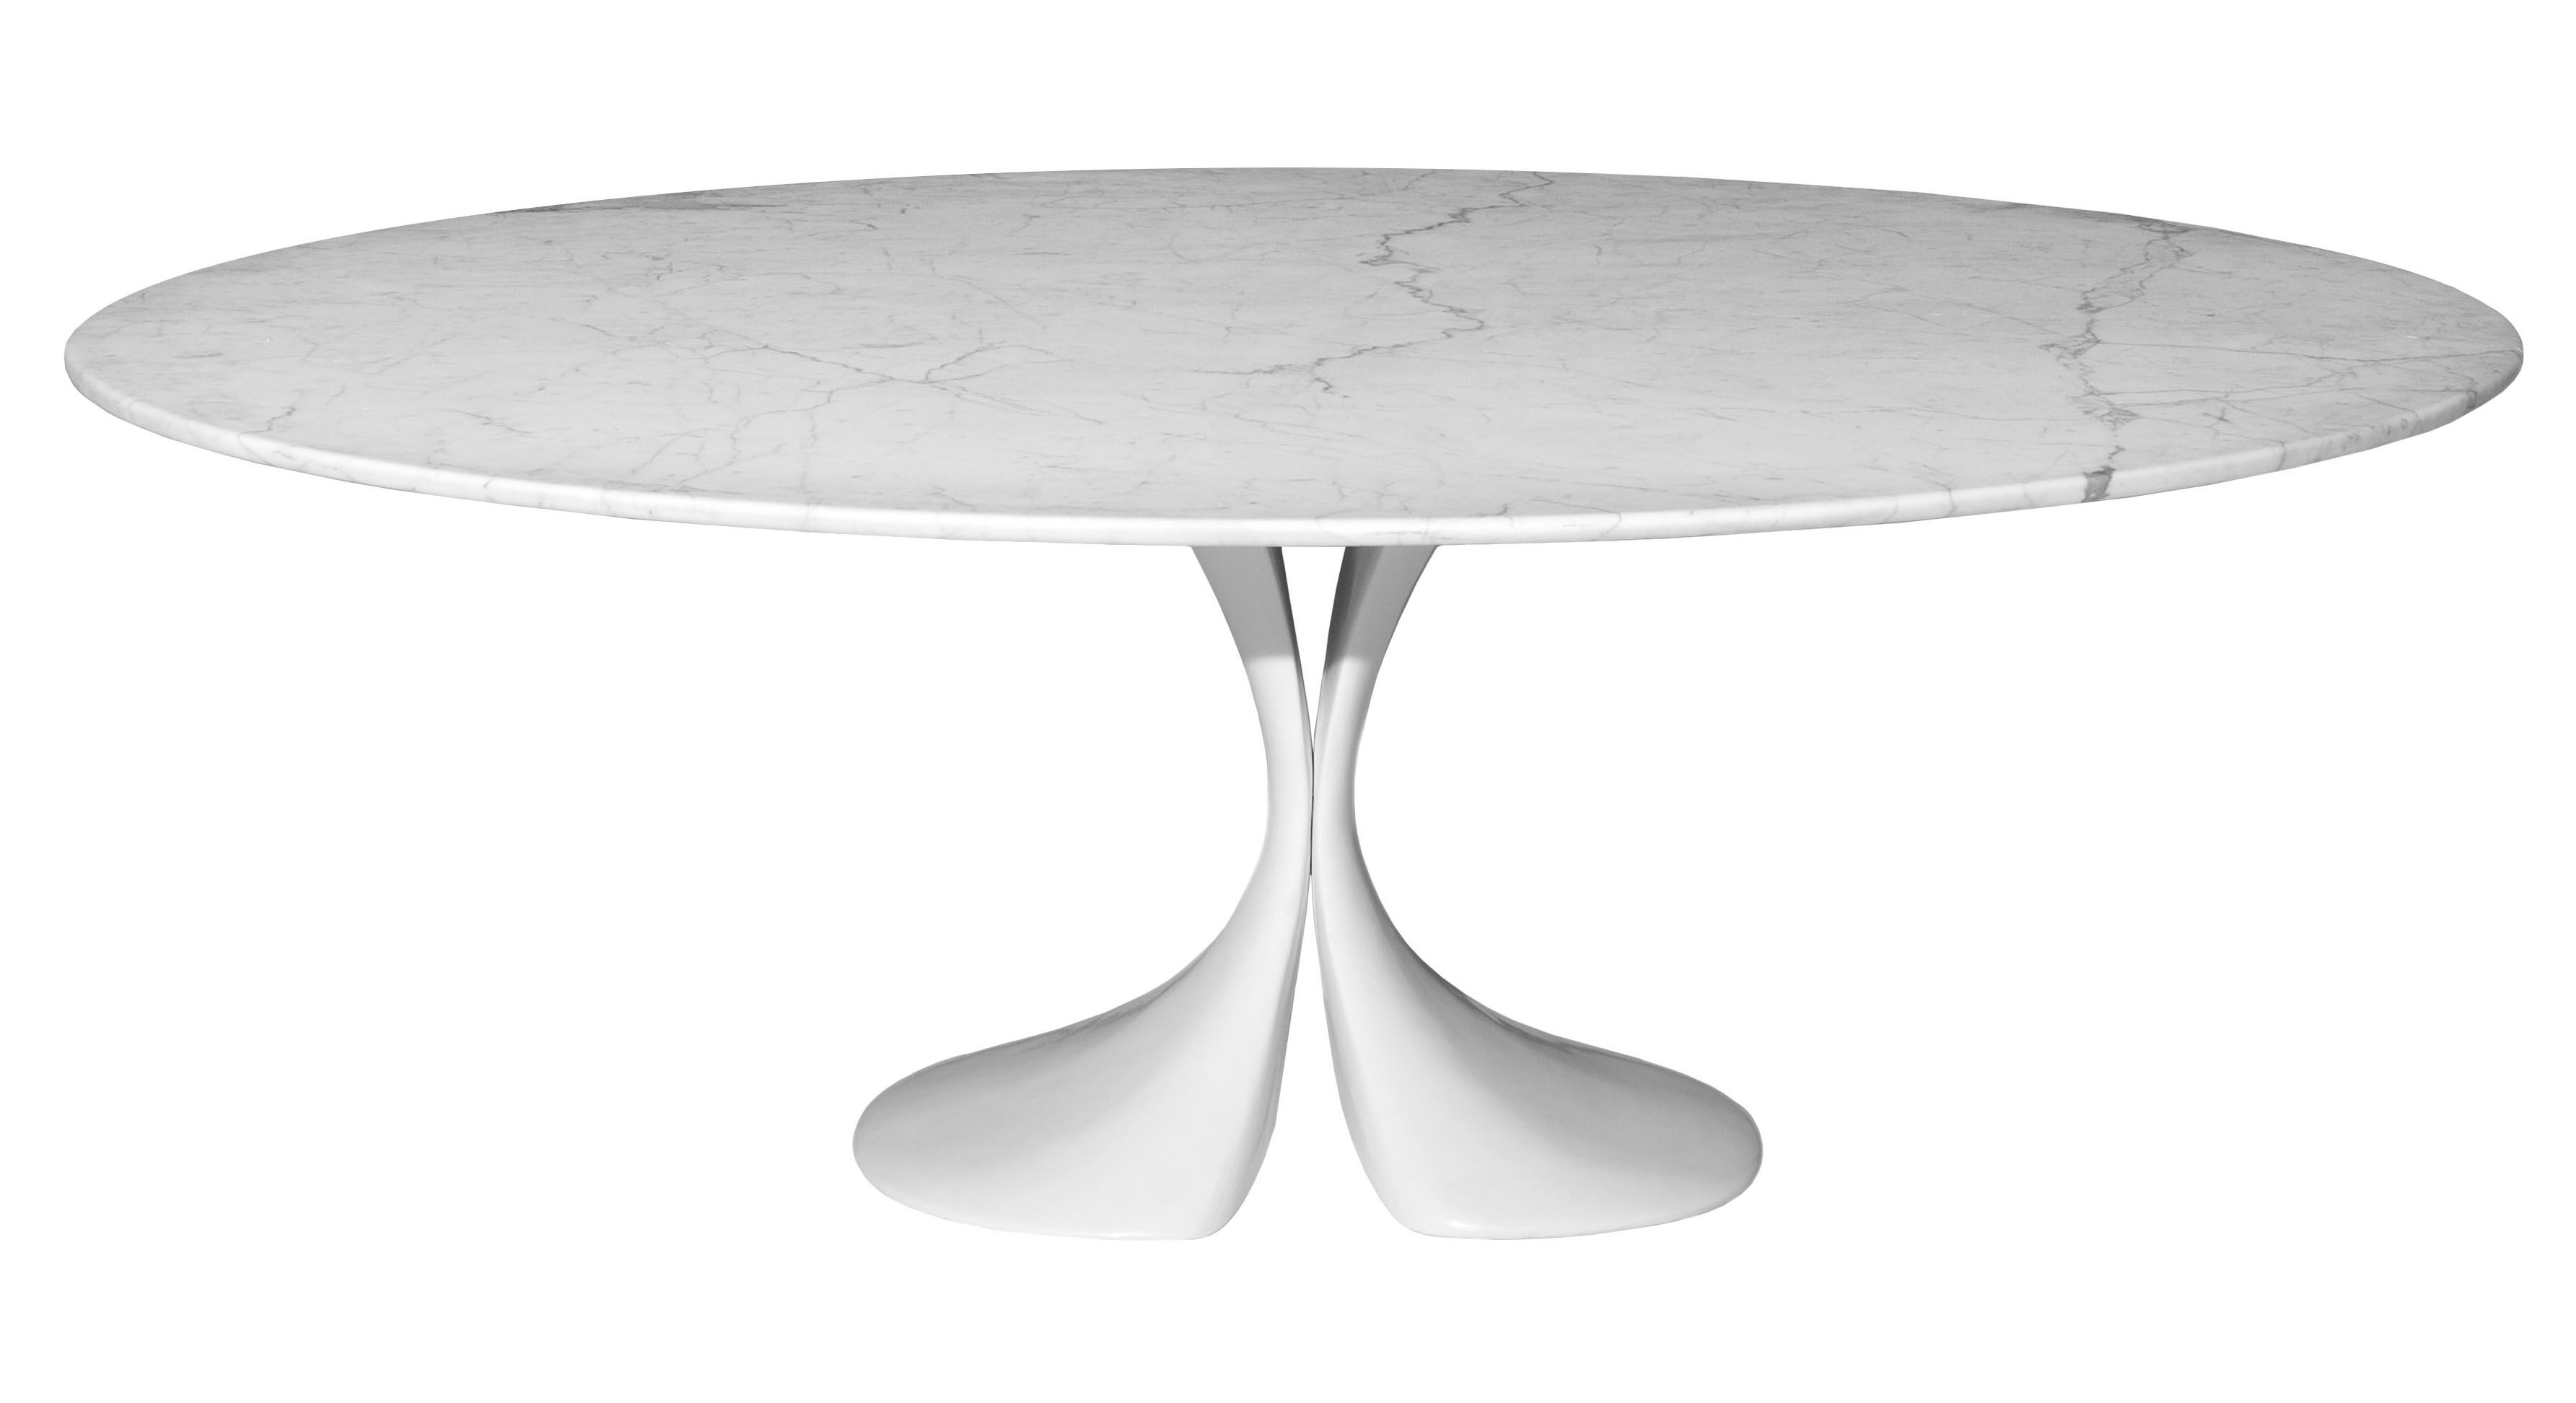 Mobilier - Tables - Table ovale Didymos / Marbre - 200 x 140 cm - Driade - Marbre blanc - Cristalplant, Marbre